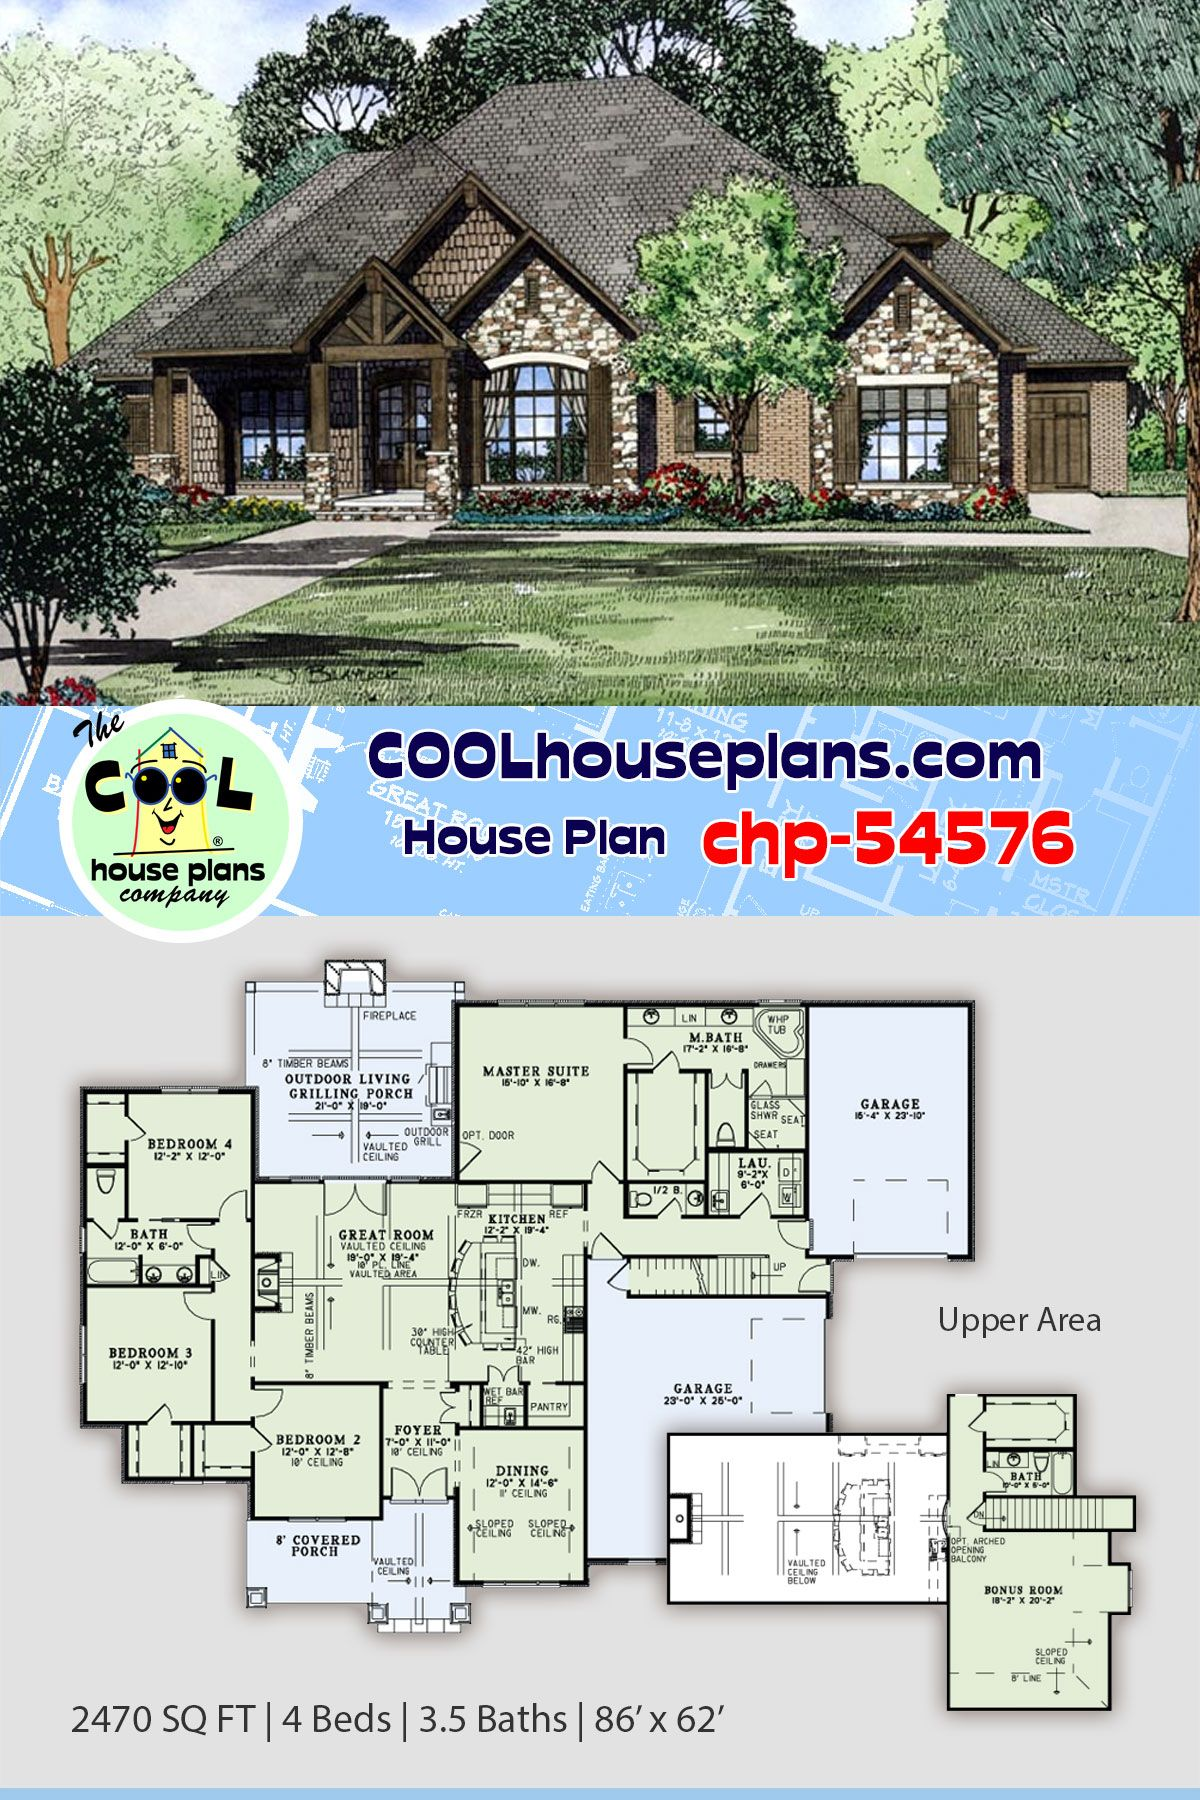 European Style House Plan 82230 With 4 Bed 4 Bath 3 Car Garage Craftsman Style House Plans Best House Plans European House